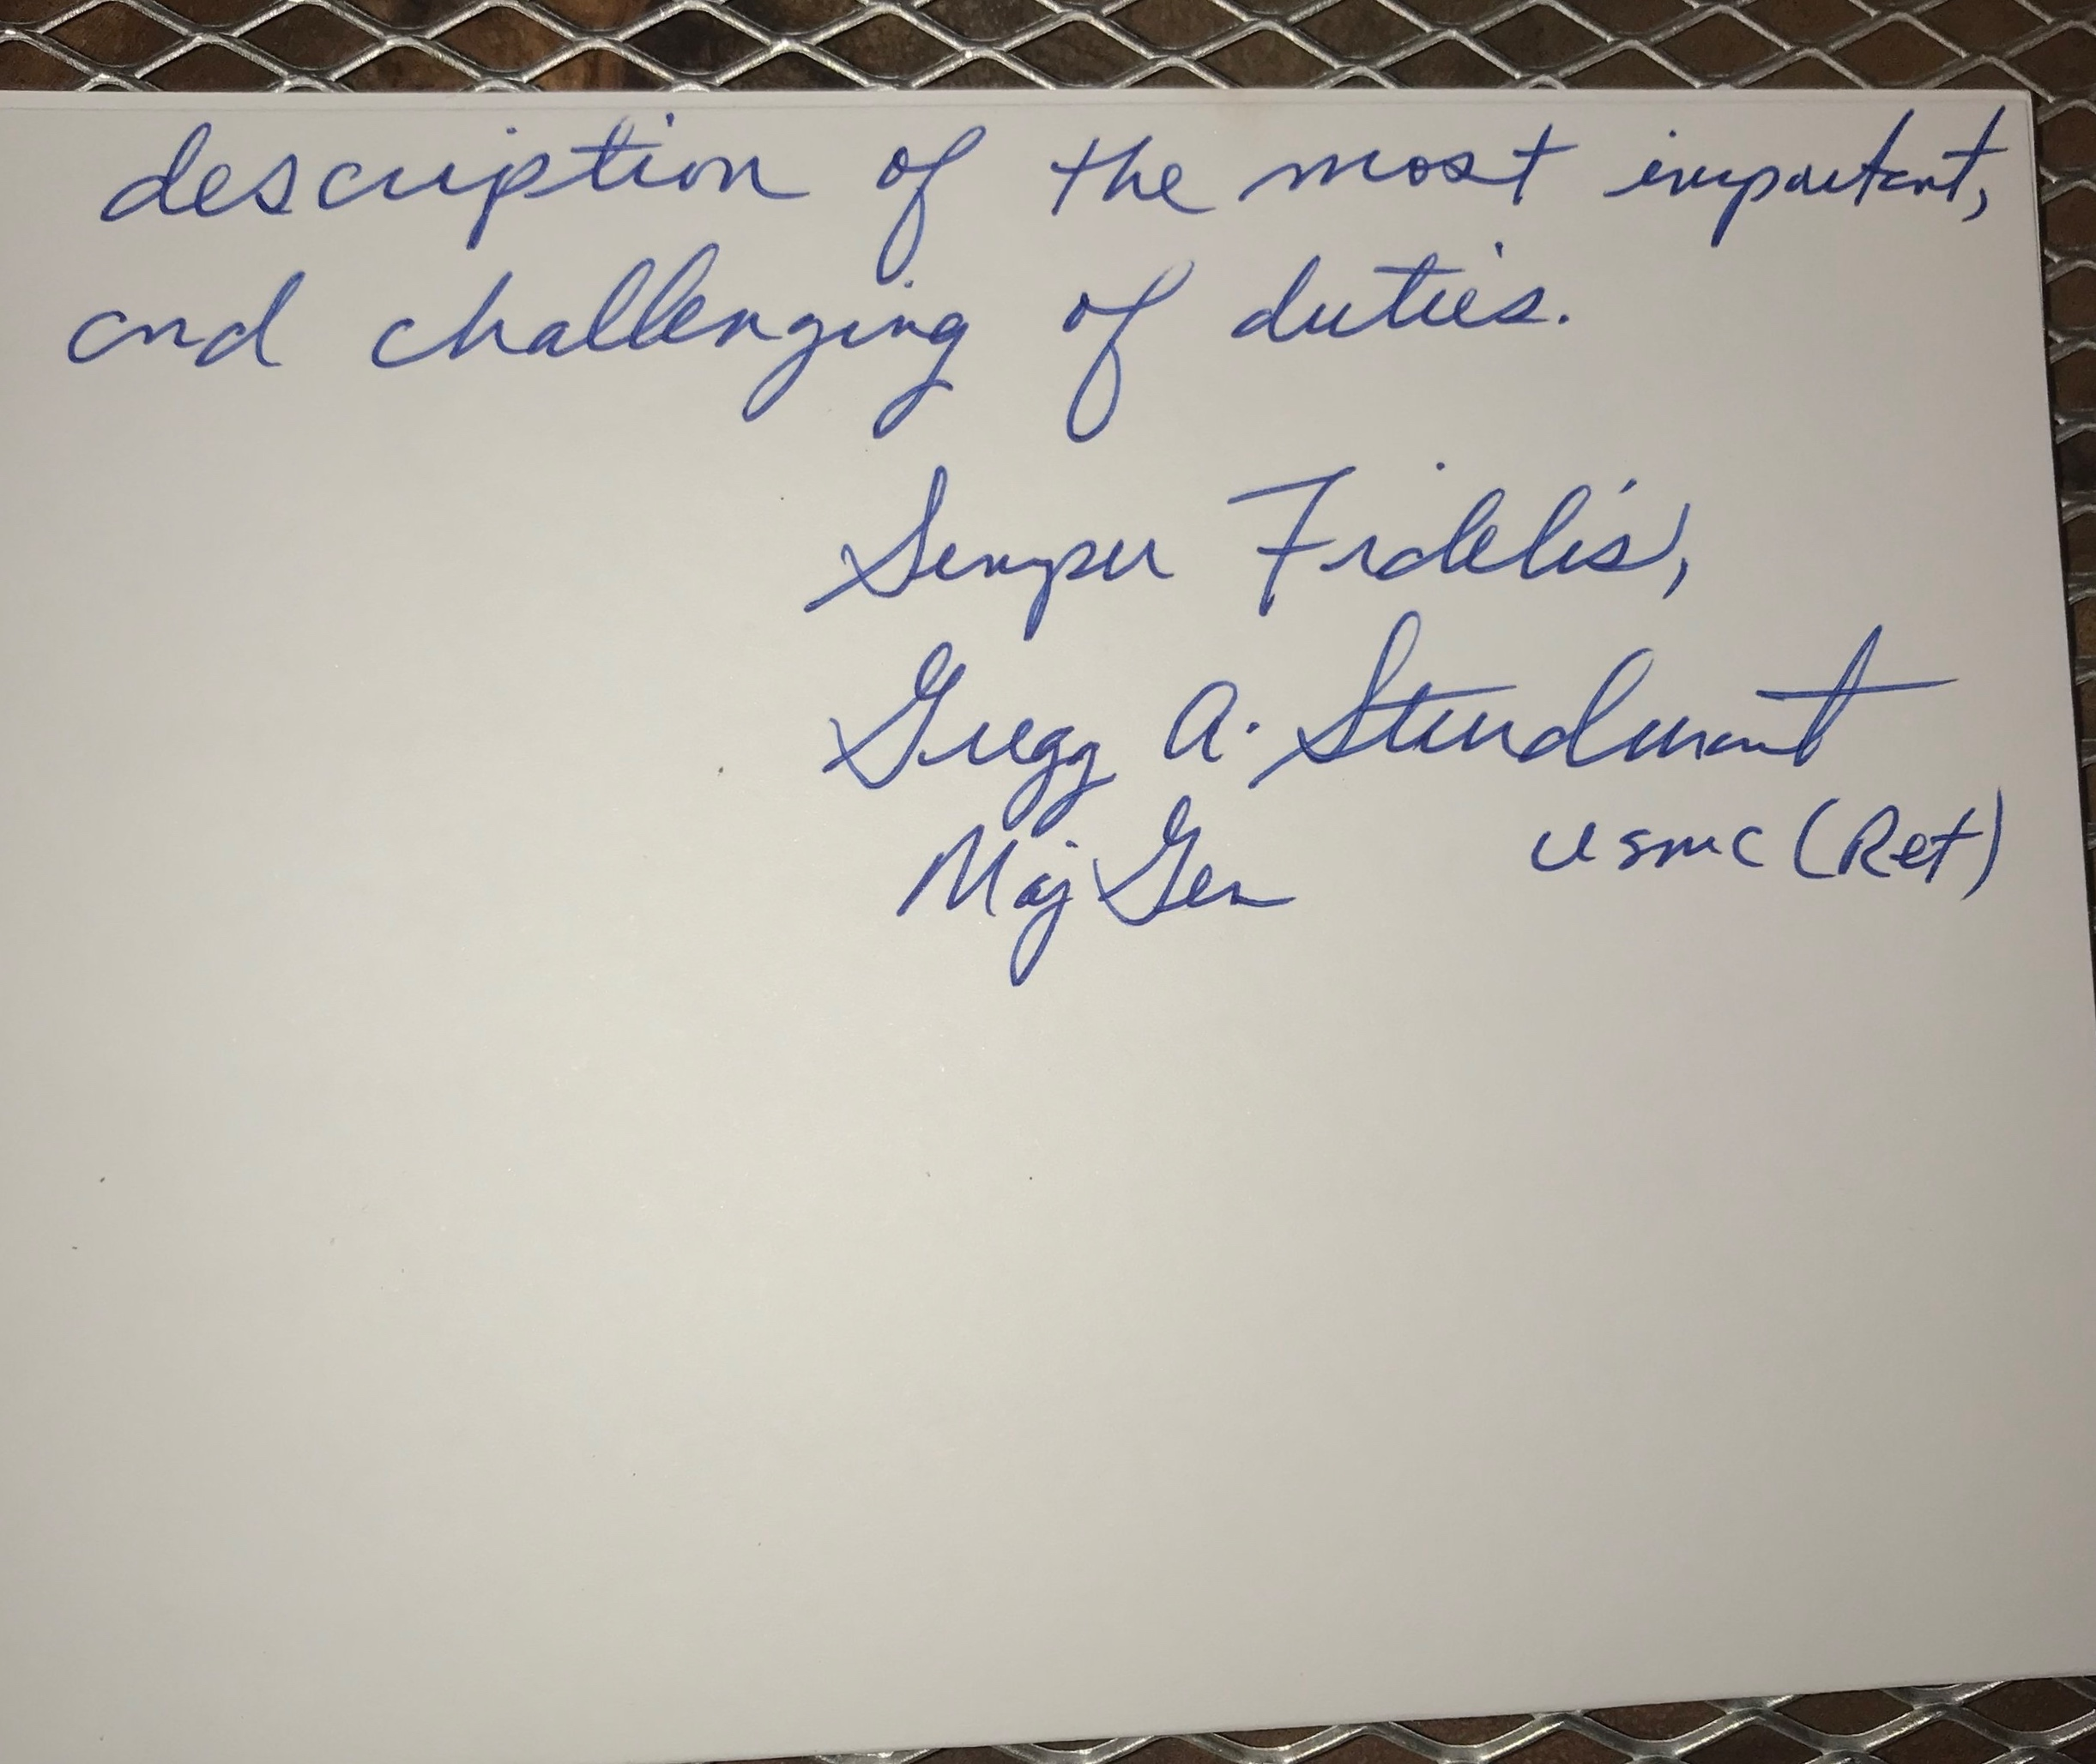 A thank you letter from MajGen Gregg A. Sturdevant USMC (ret) #2